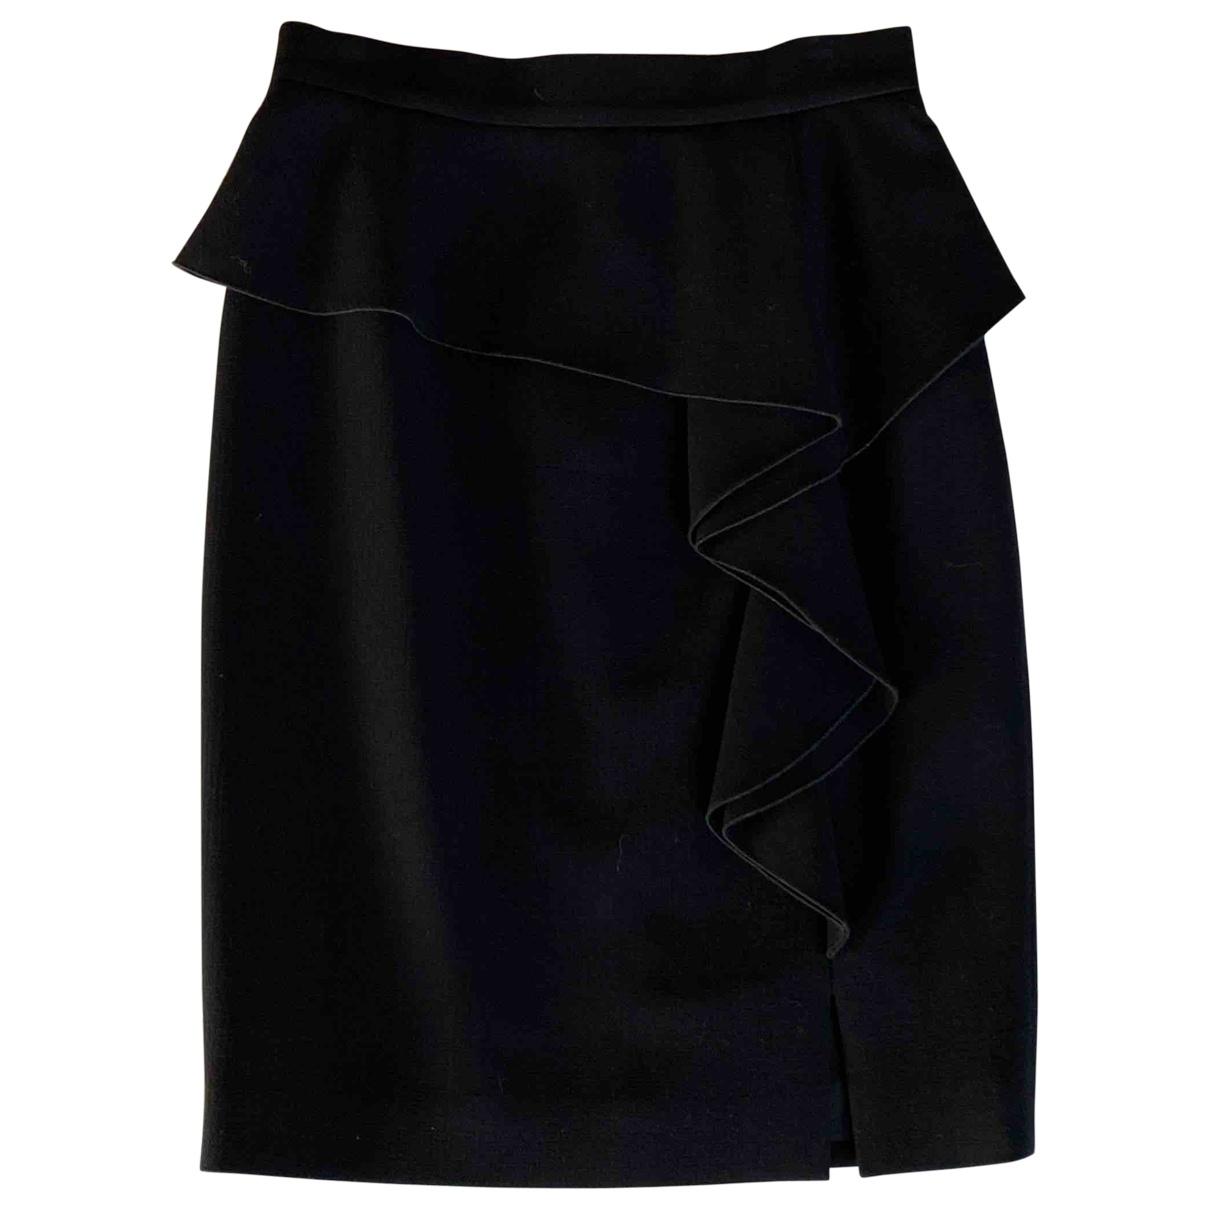 Emilio Pucci \N Black Wool skirt for Women 36 FR